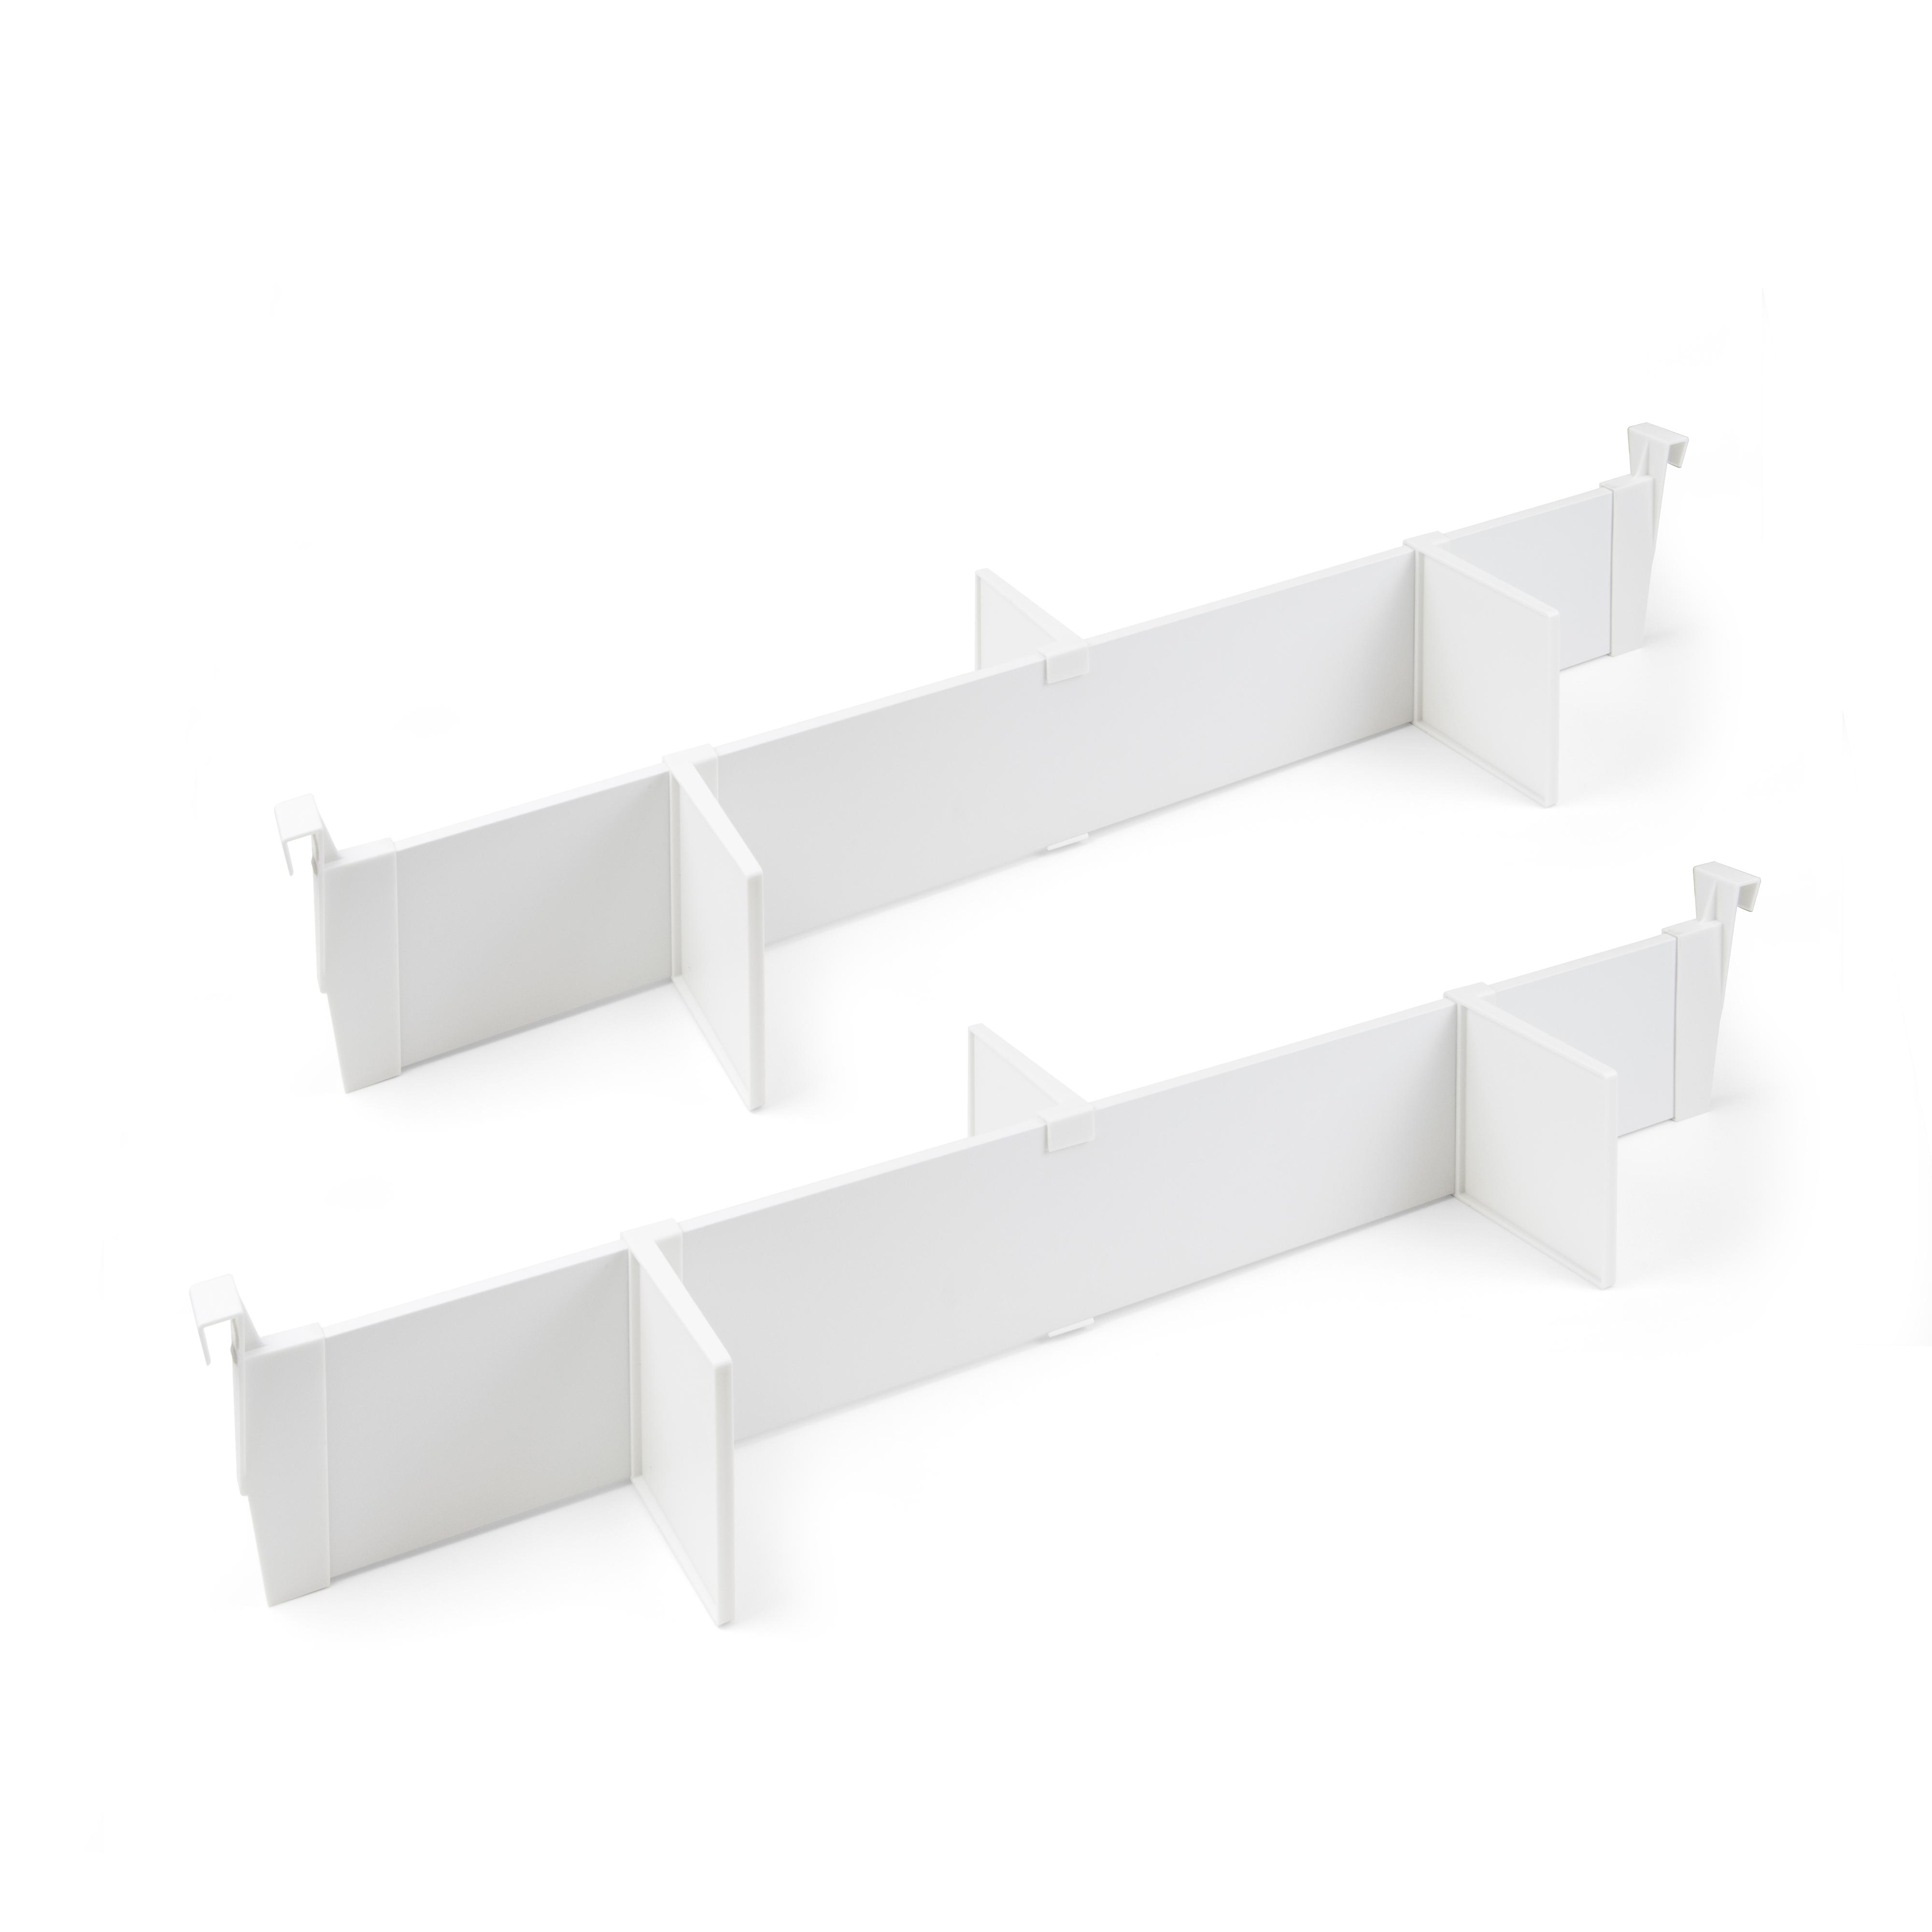 Emuca Set separatori regolabili per cassetti, accessori divisori organizer per cassetti 900mm, alluminio, bianco